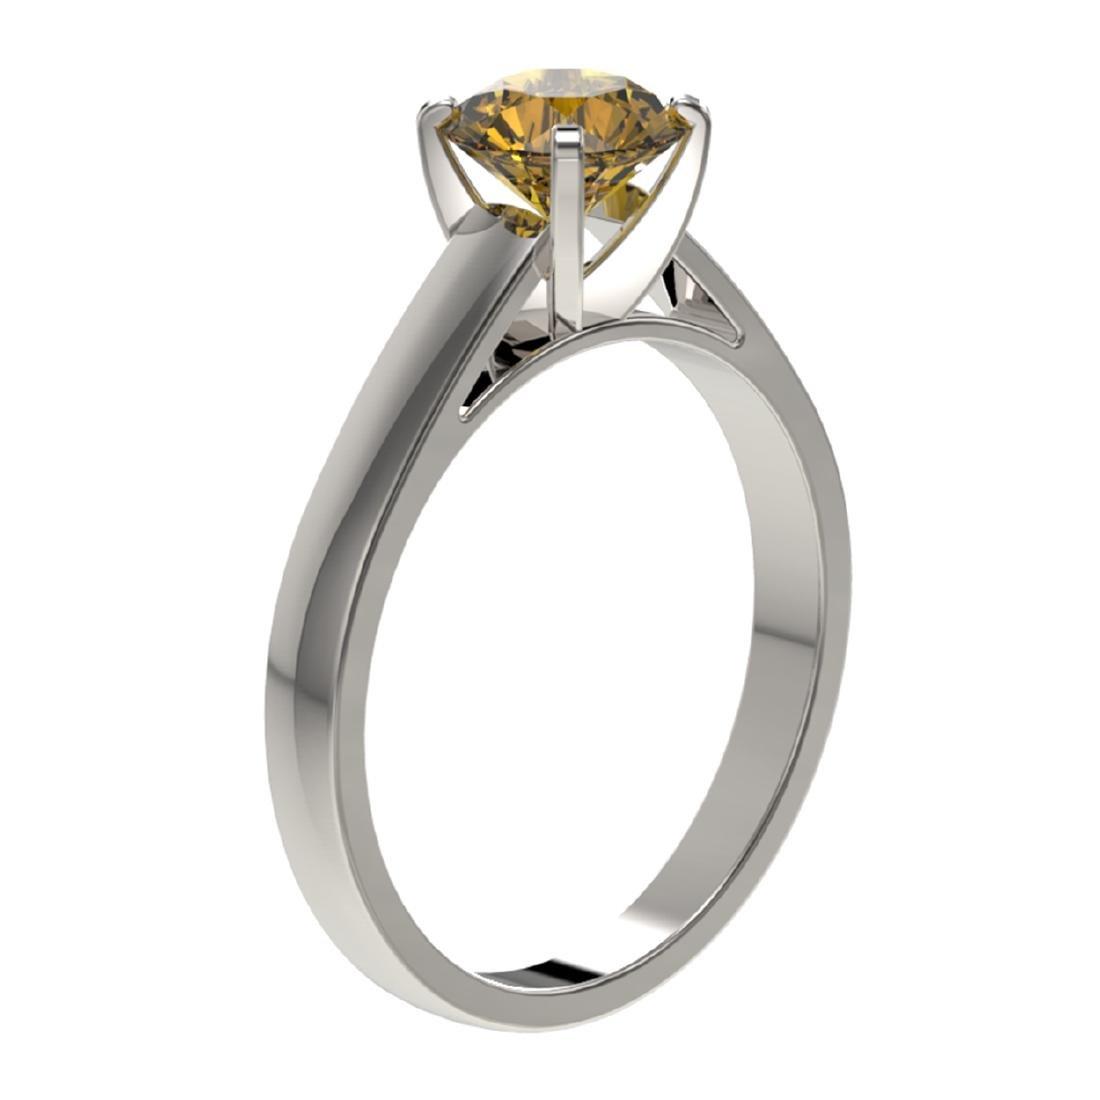 1.29 ctw Intense Yellow Diamond Solitaire Ring 10K - 3